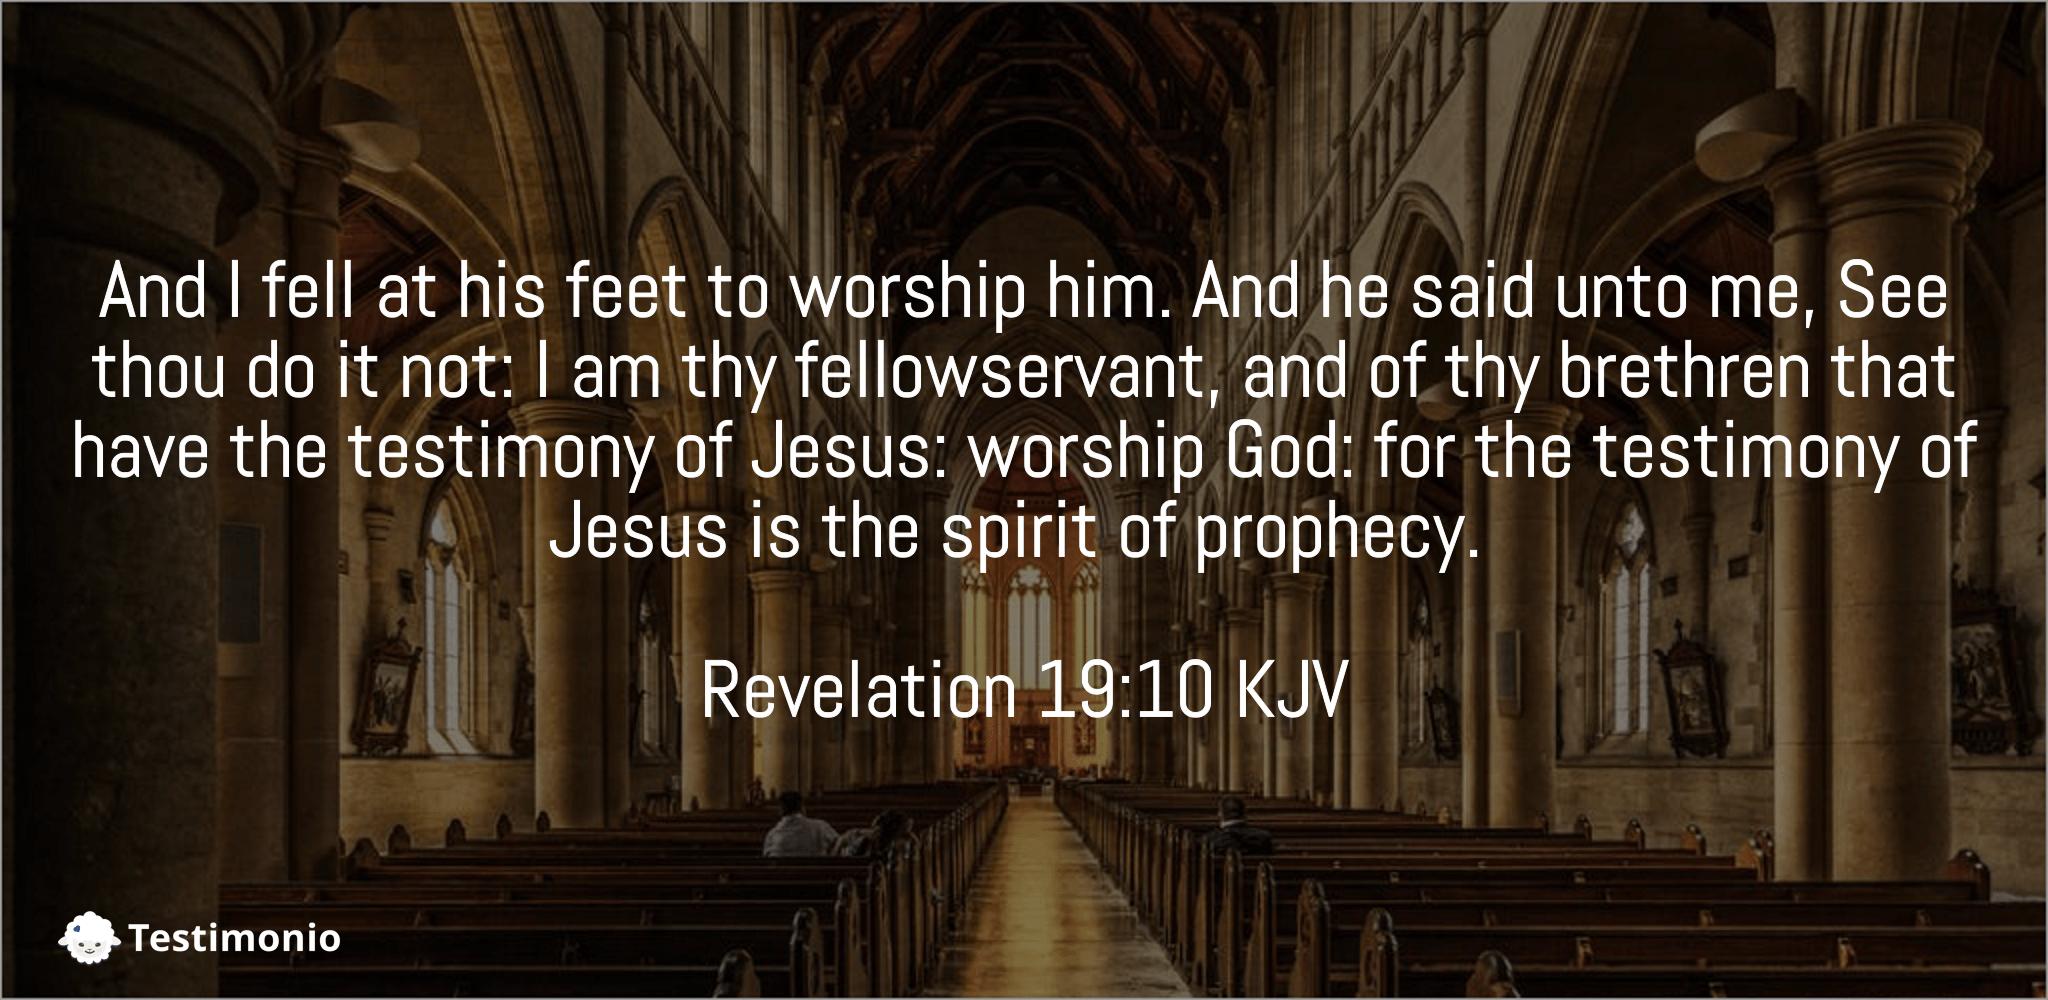 Revelation 19:10